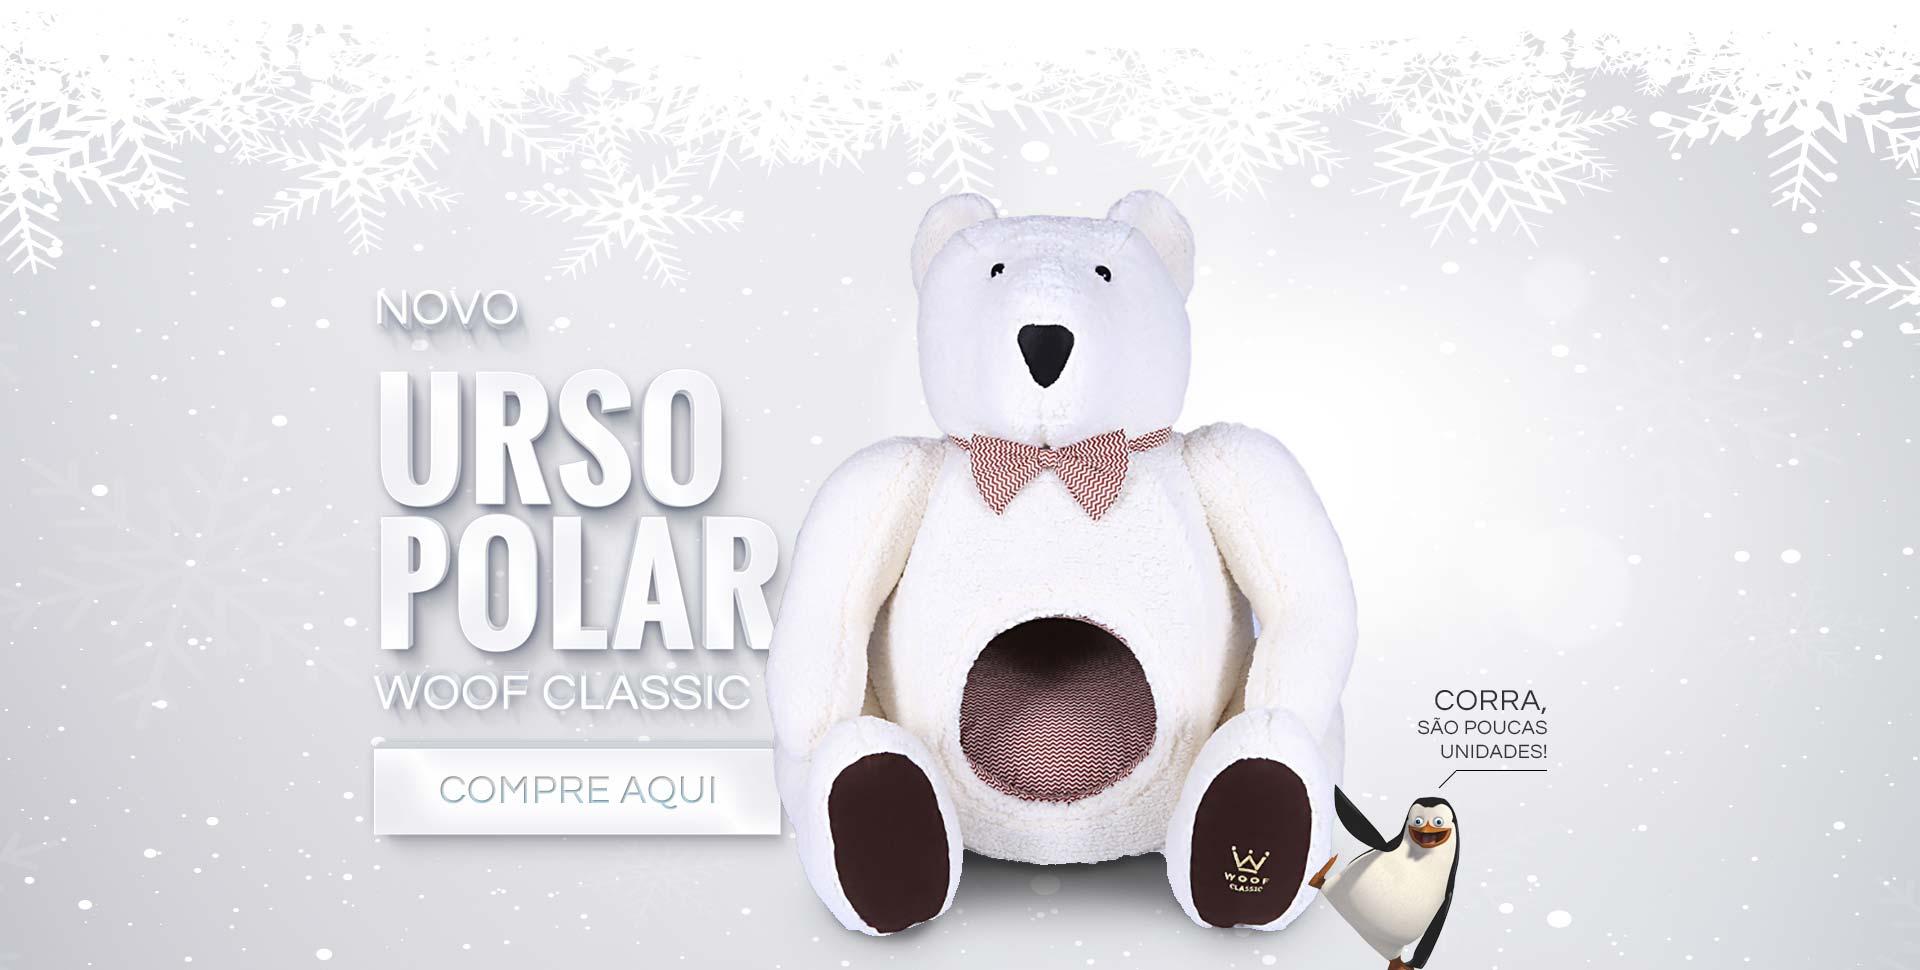 Urso Polar Woof